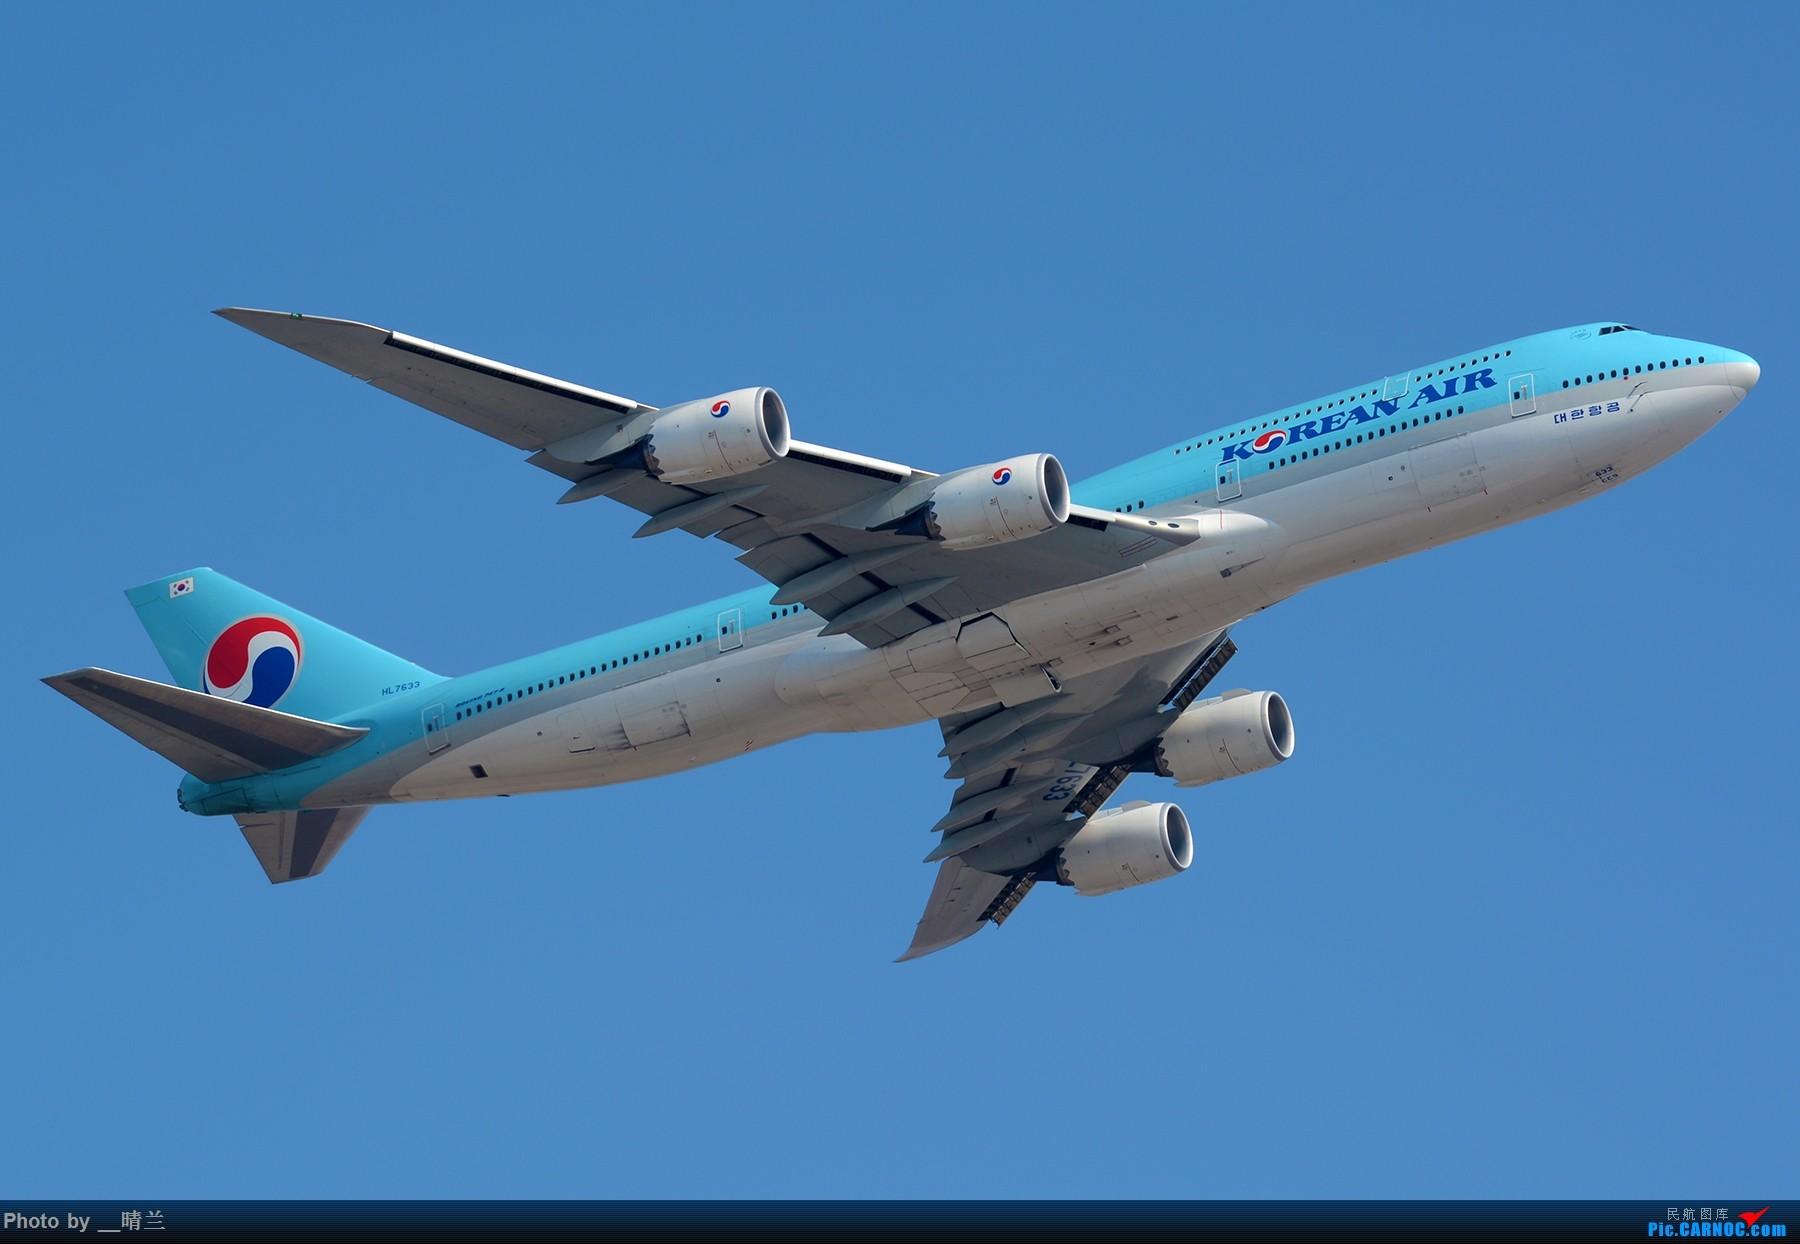 Re:[原创]【PVG】大年初二 新角度解锁 集齐7只77W 召唤748一枚!#祝各位飞友新的一年一飞冲天!# BOEING 747-8I HL7633 中国上海浦东国际机场